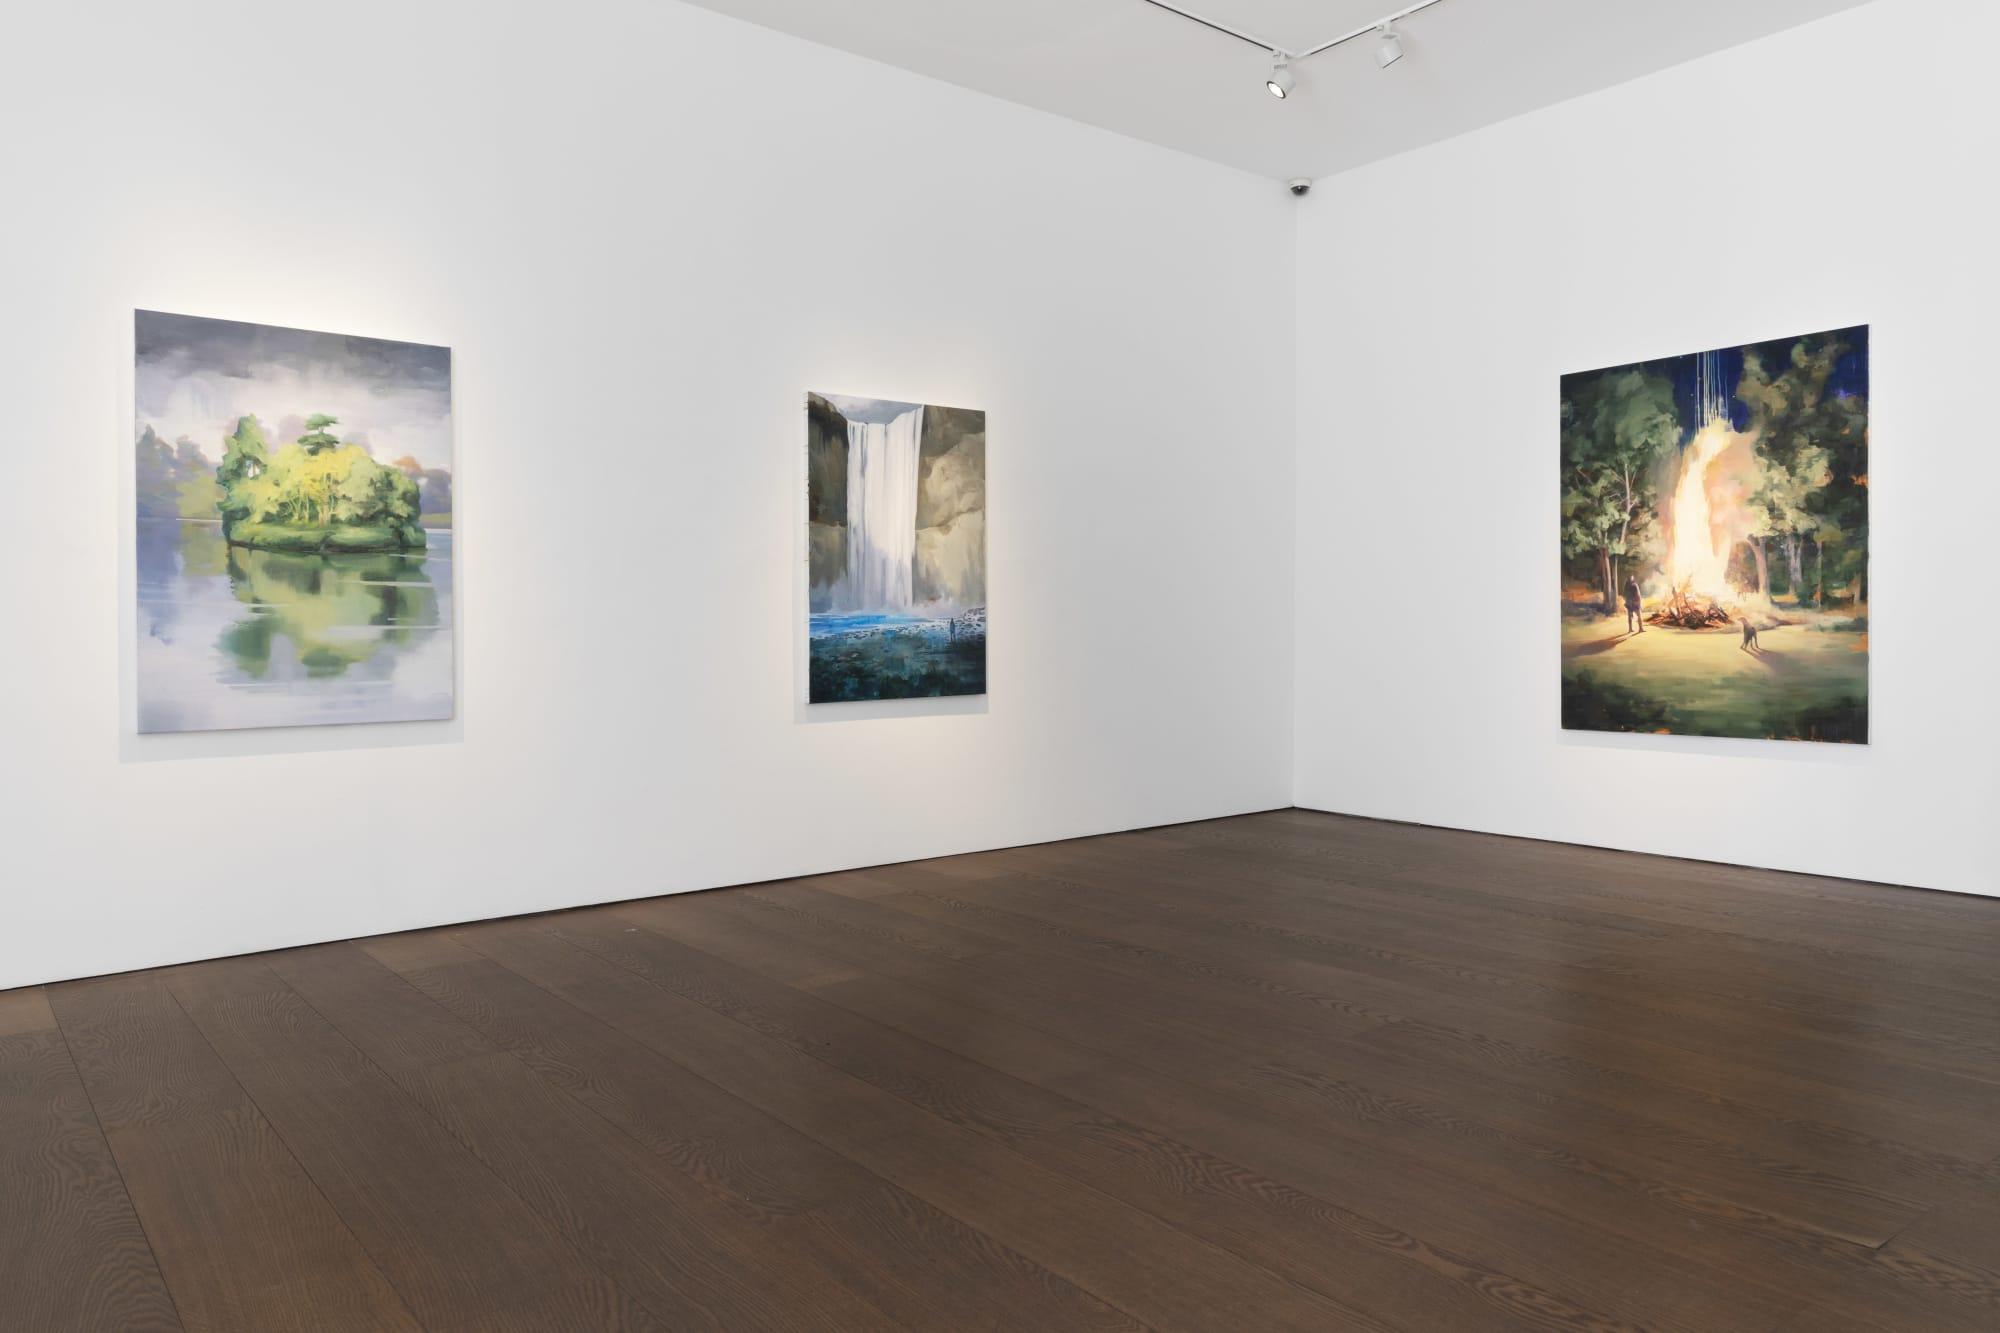 Tai Shan Schierenberg Figuring the Landscape